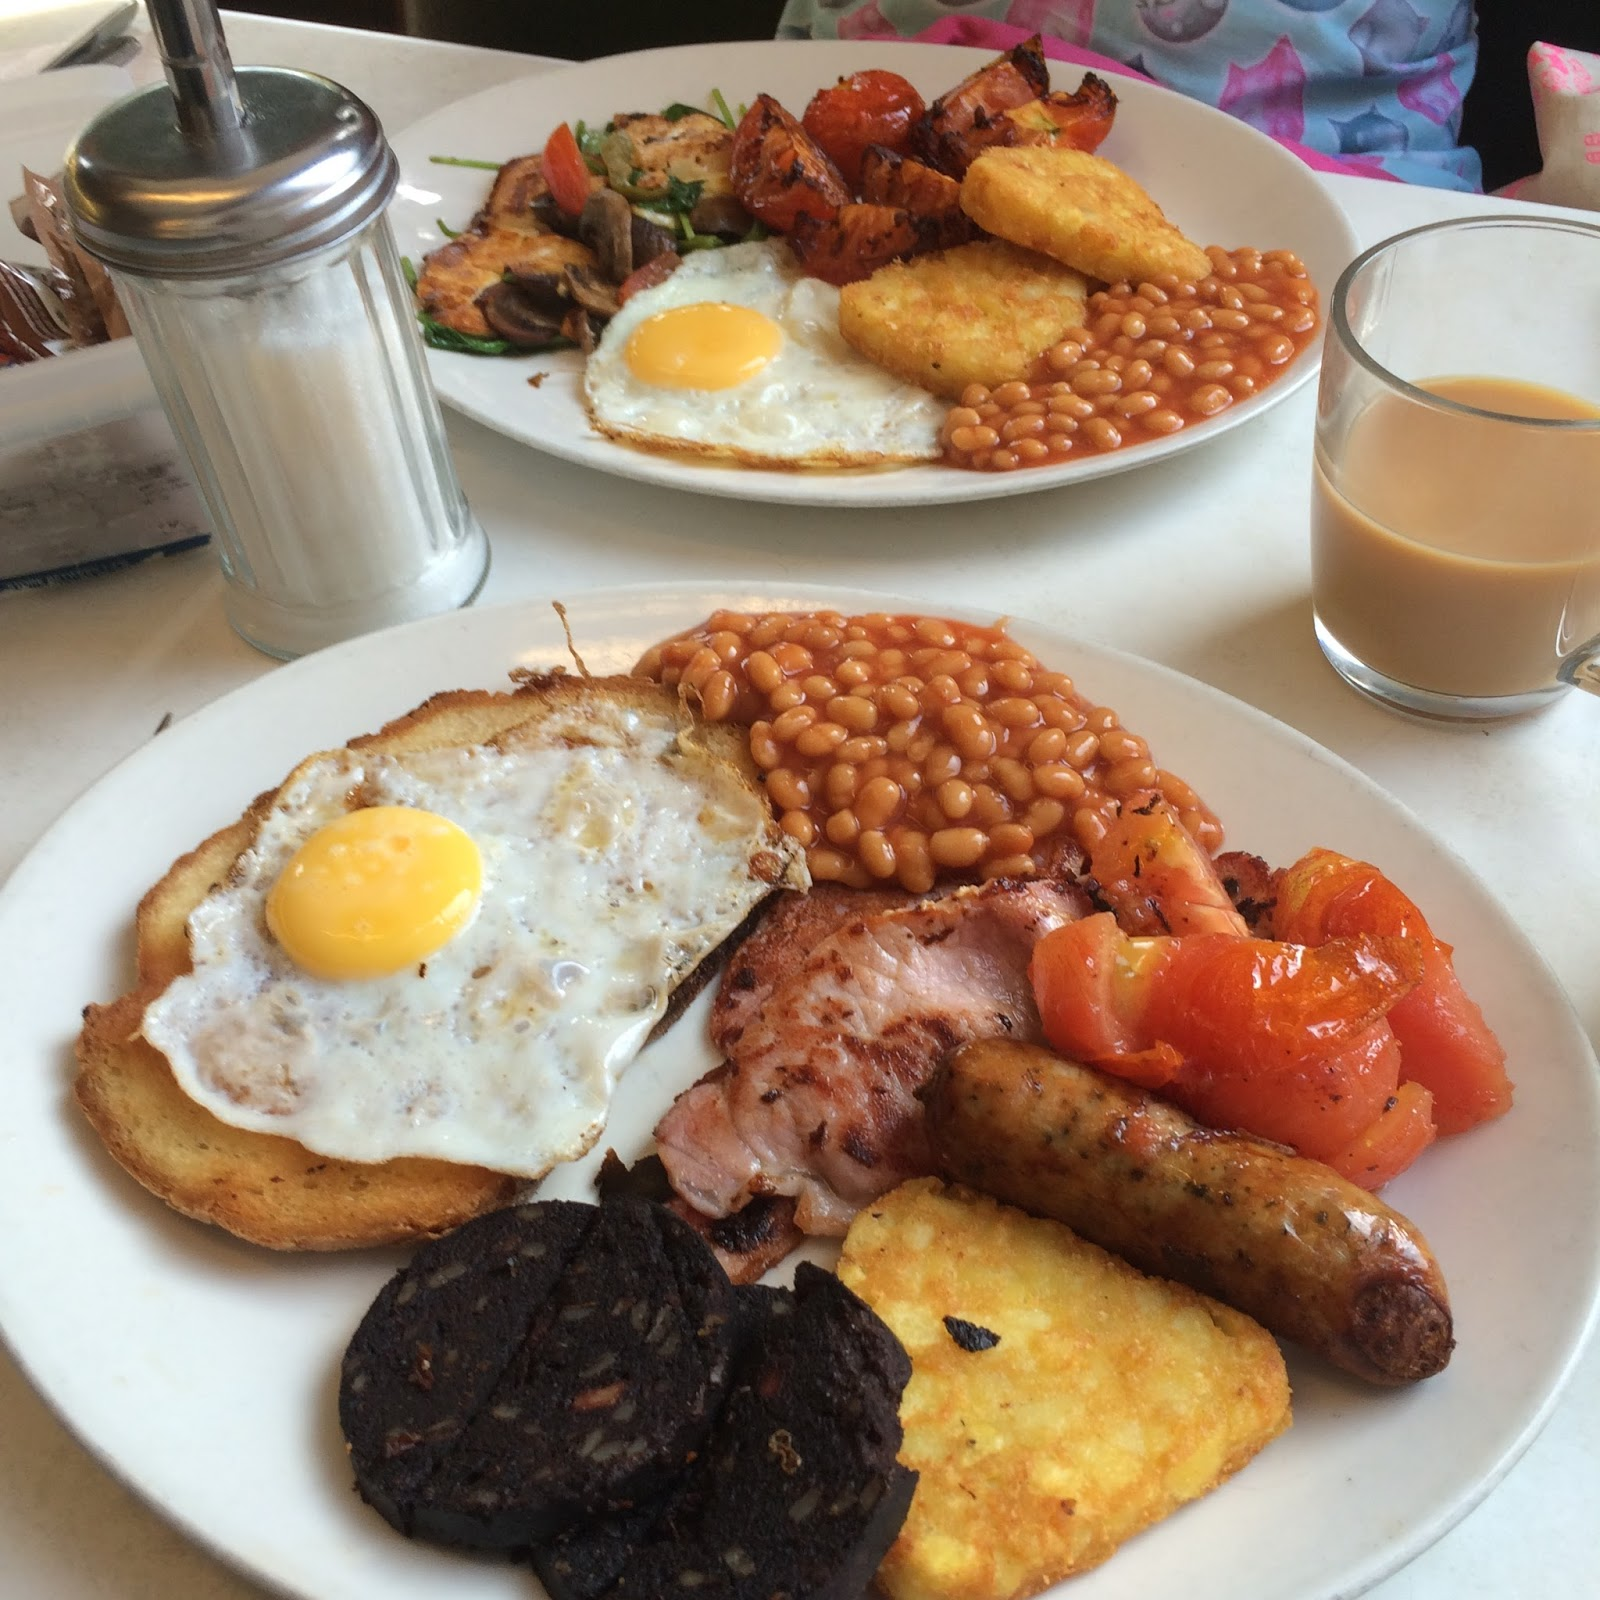 The Fry Up Inspector: Best Breakfasts In London